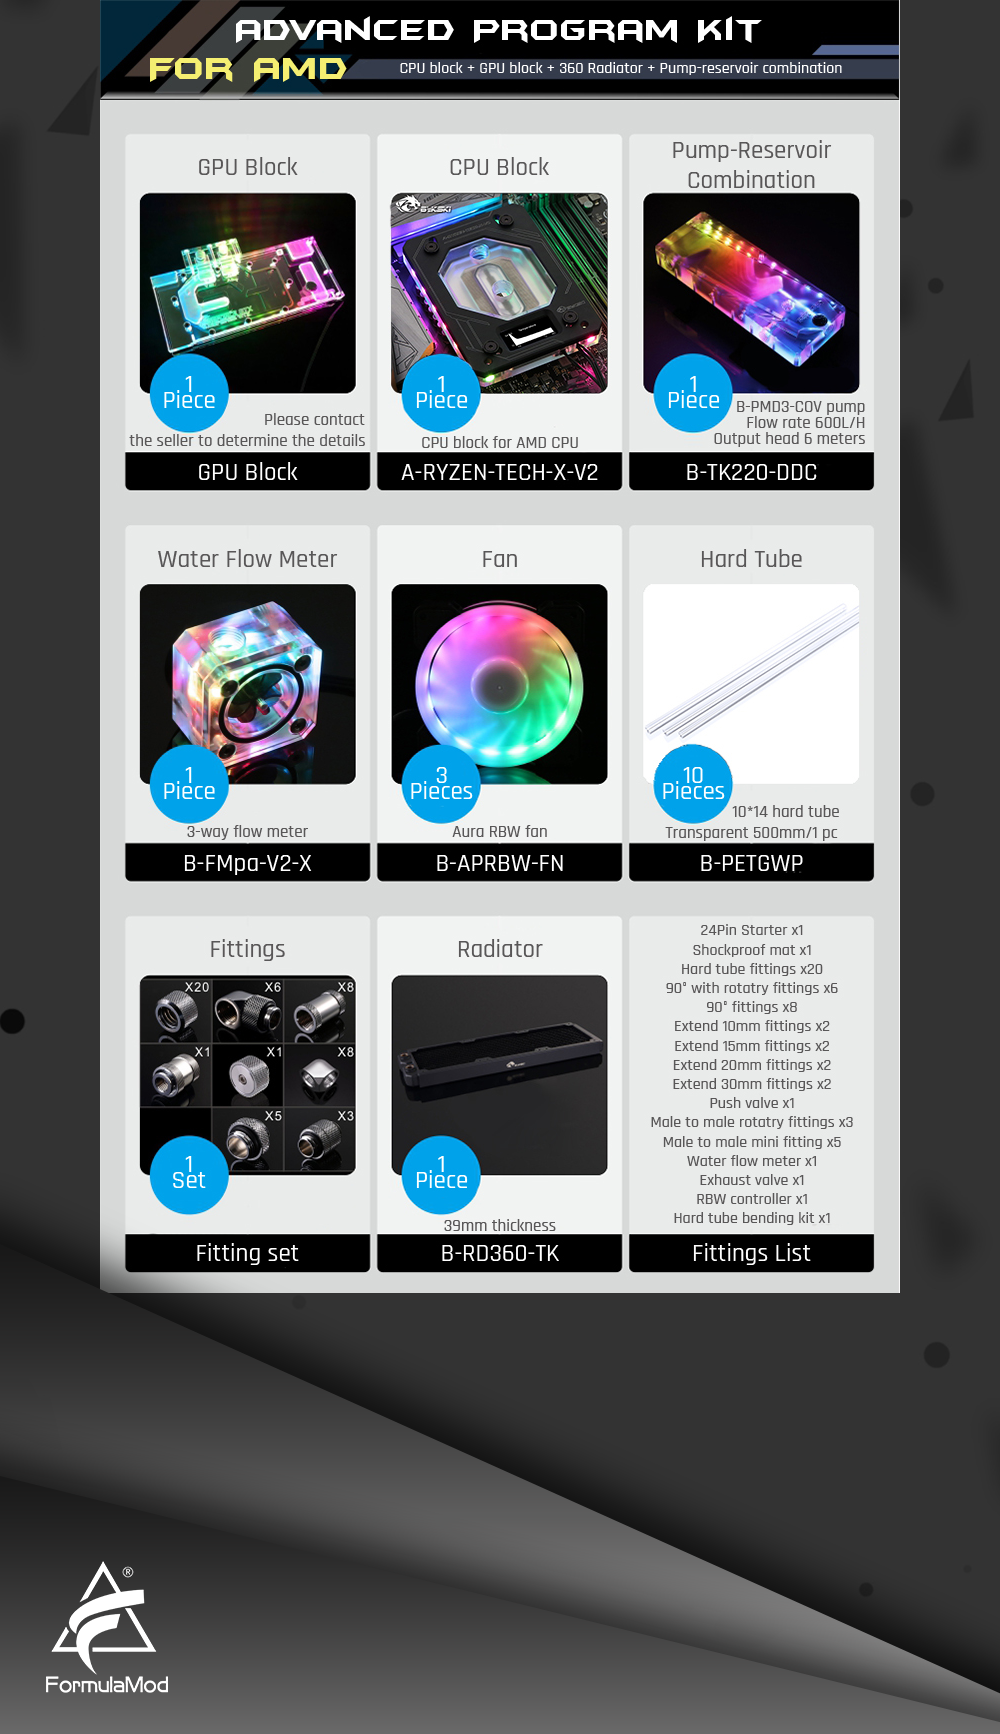 Bykski B-HTRGB-EX, RBW 5v 3pin Hard Tube Advanced Program Kits, For Intel/AMD Cooling Customizable Modification